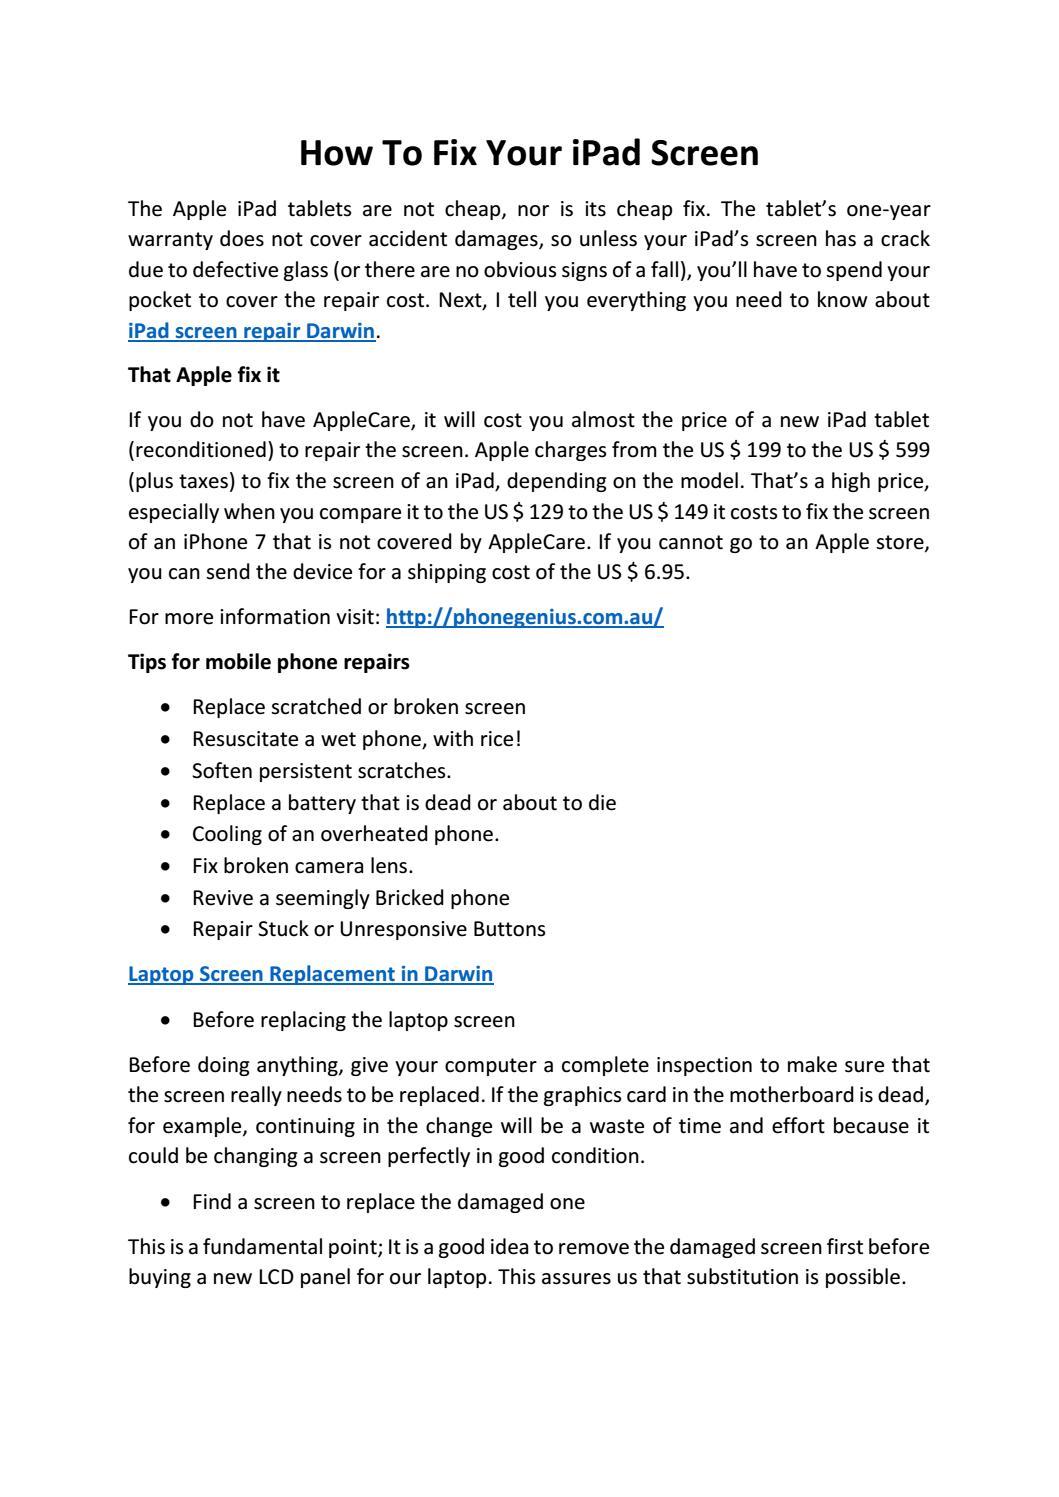 How To Fix Your iPad Screen by Anshul kumar - issuu